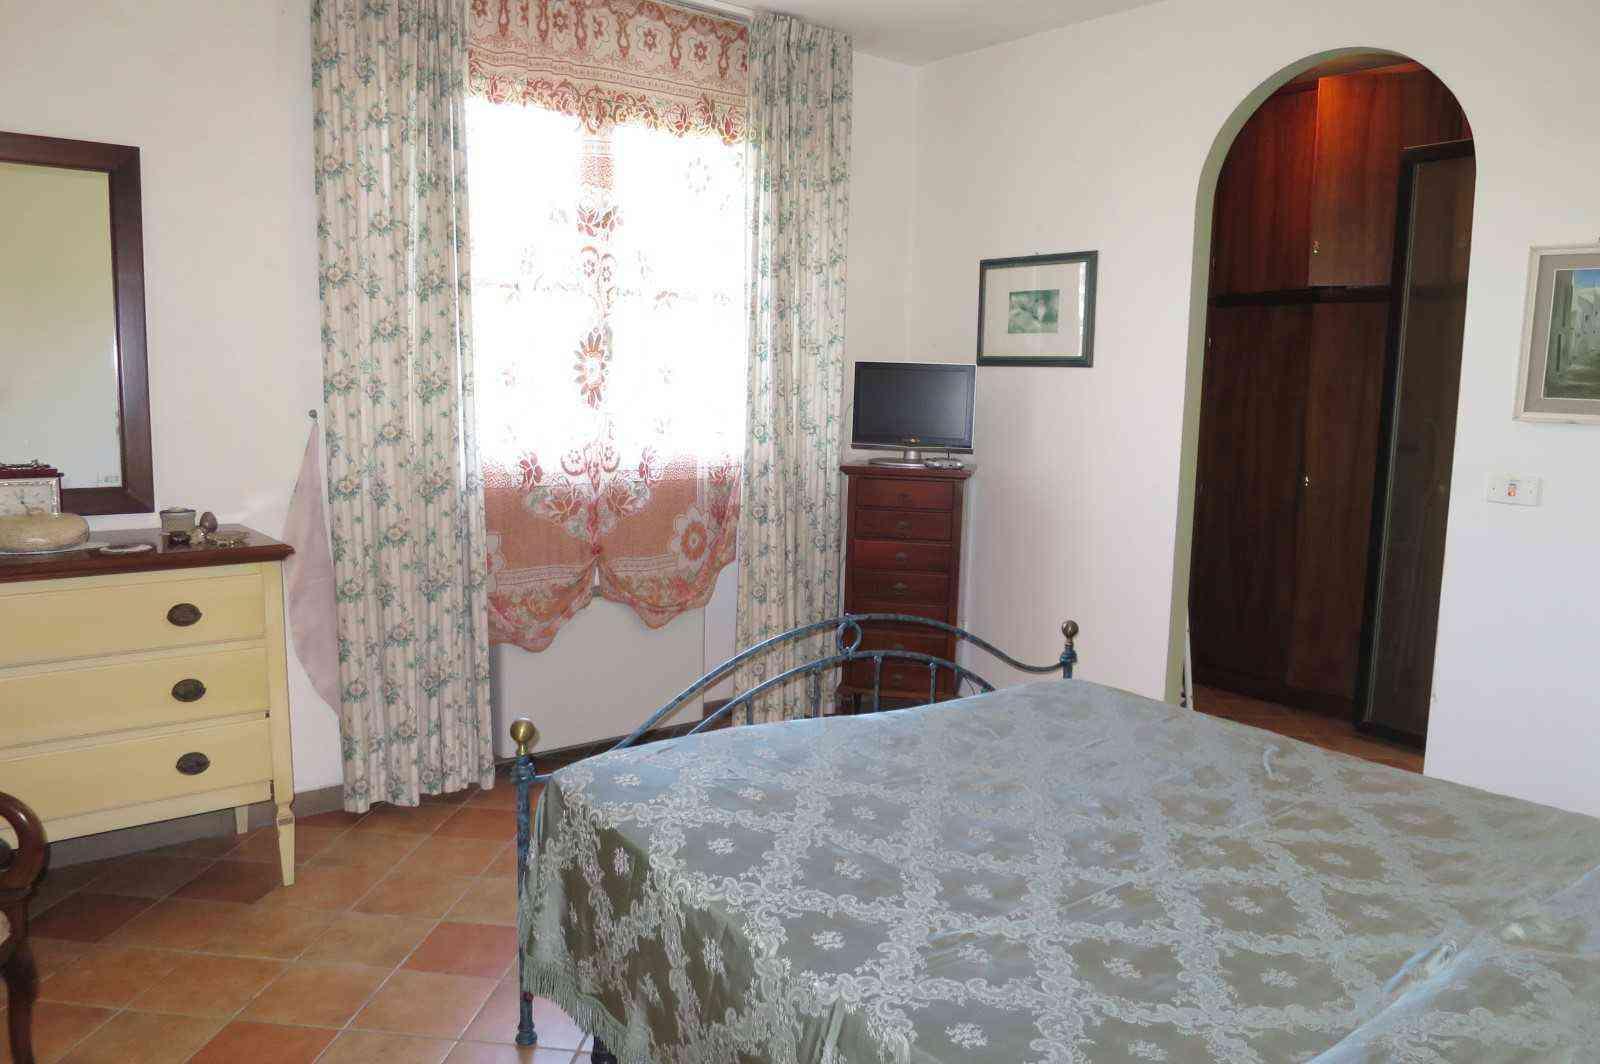 Villa Villa in vendita Atri (TE), Villa Paola - Atri - EUR 473.281 190